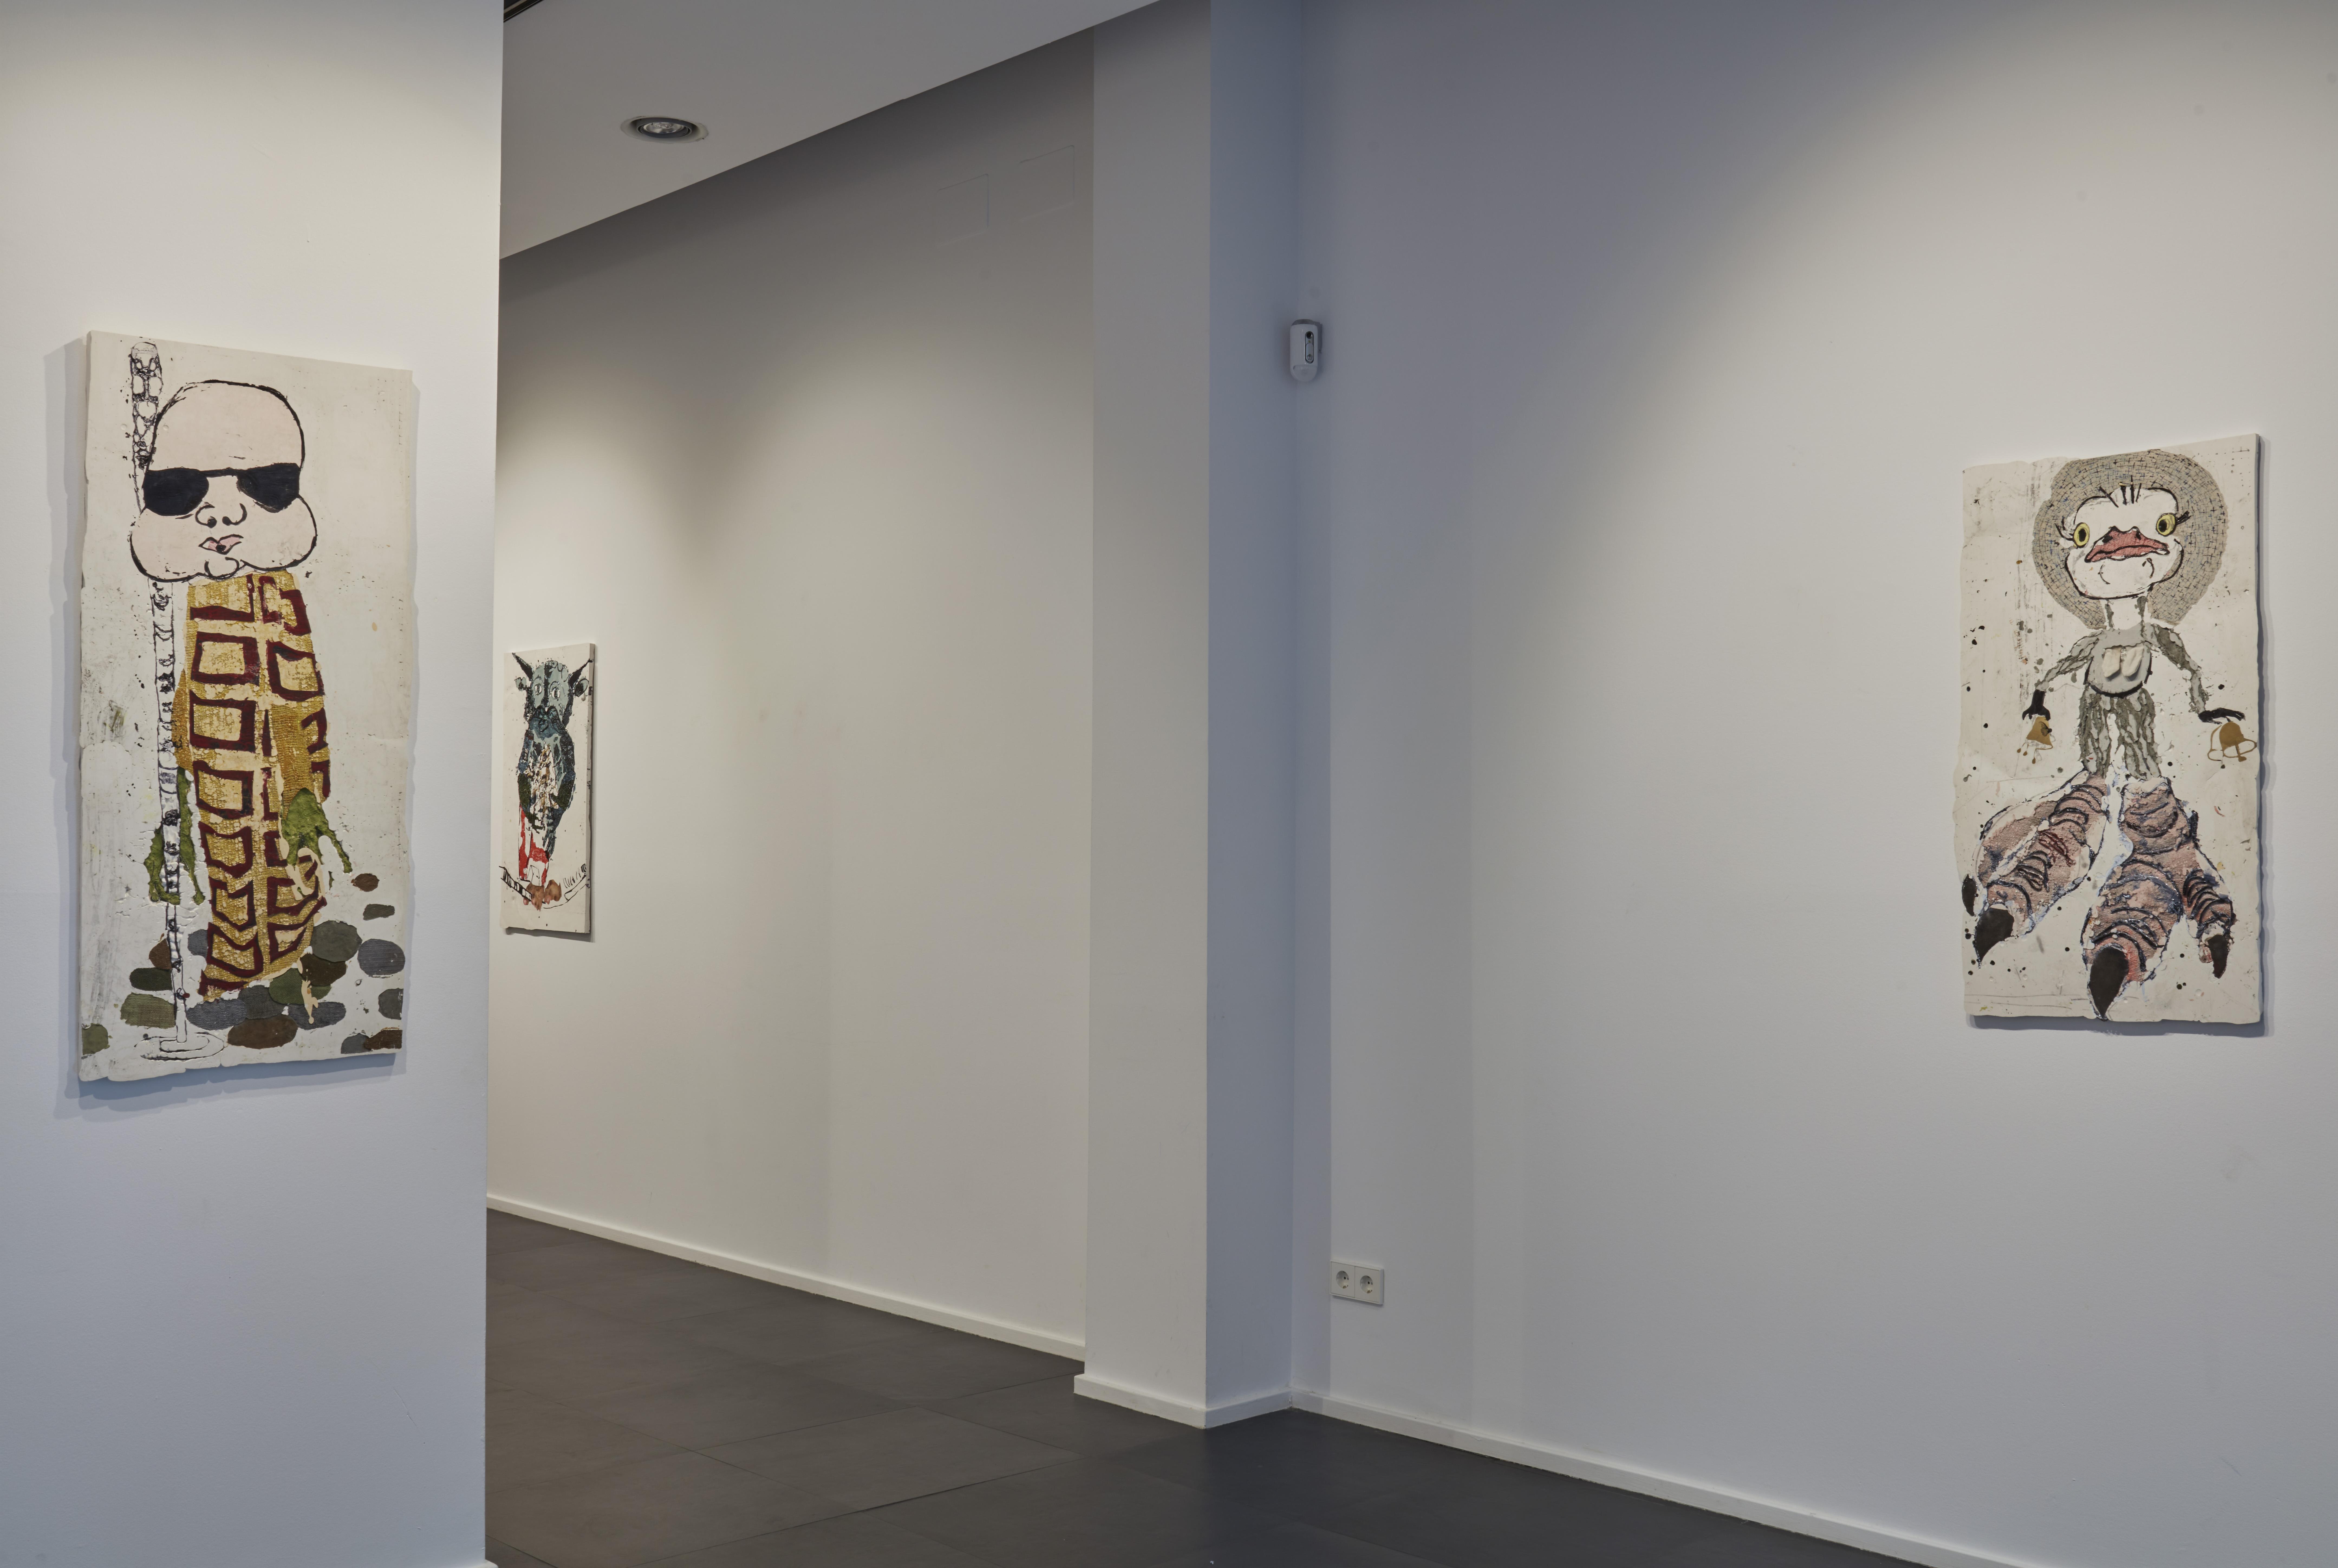 https://www.fahrenheitmadrid.com/wp-content/uploads/2021/07/patoybebe-1.jpg